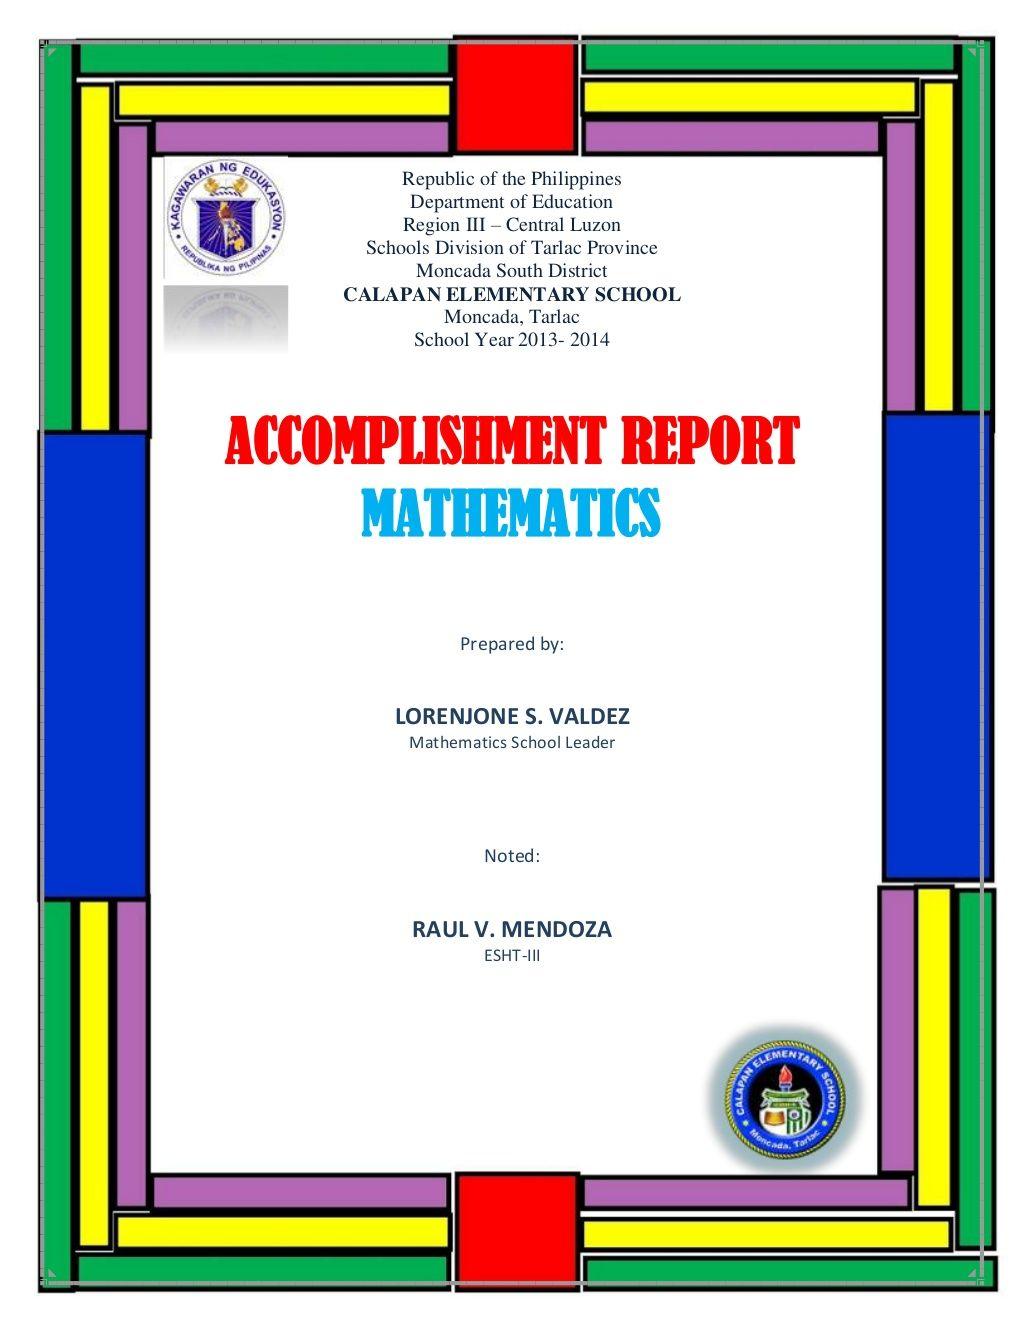 Accomplishment Report Math By Reon Zedval Via Slideshare School